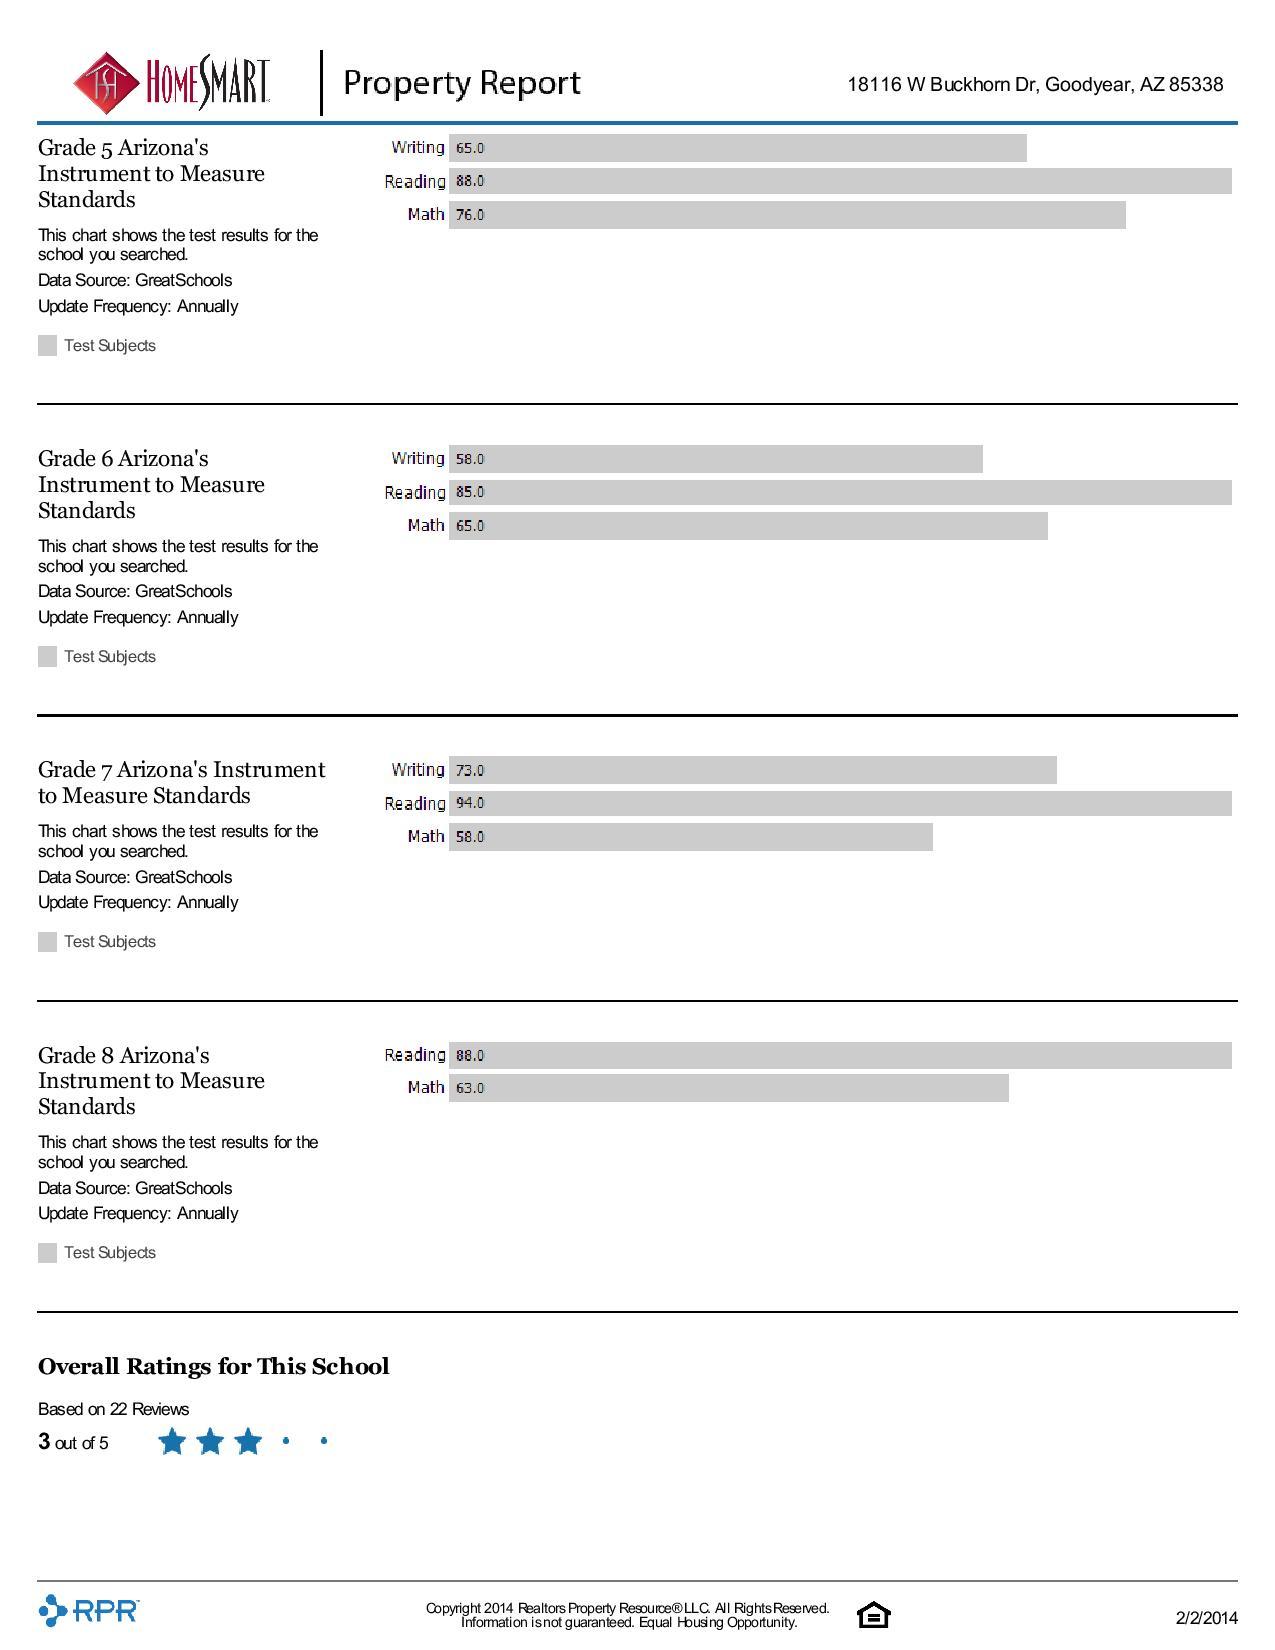 18116-W-Buckhorn-Dr-Goodyear-AZ-85338.pdf-page-013